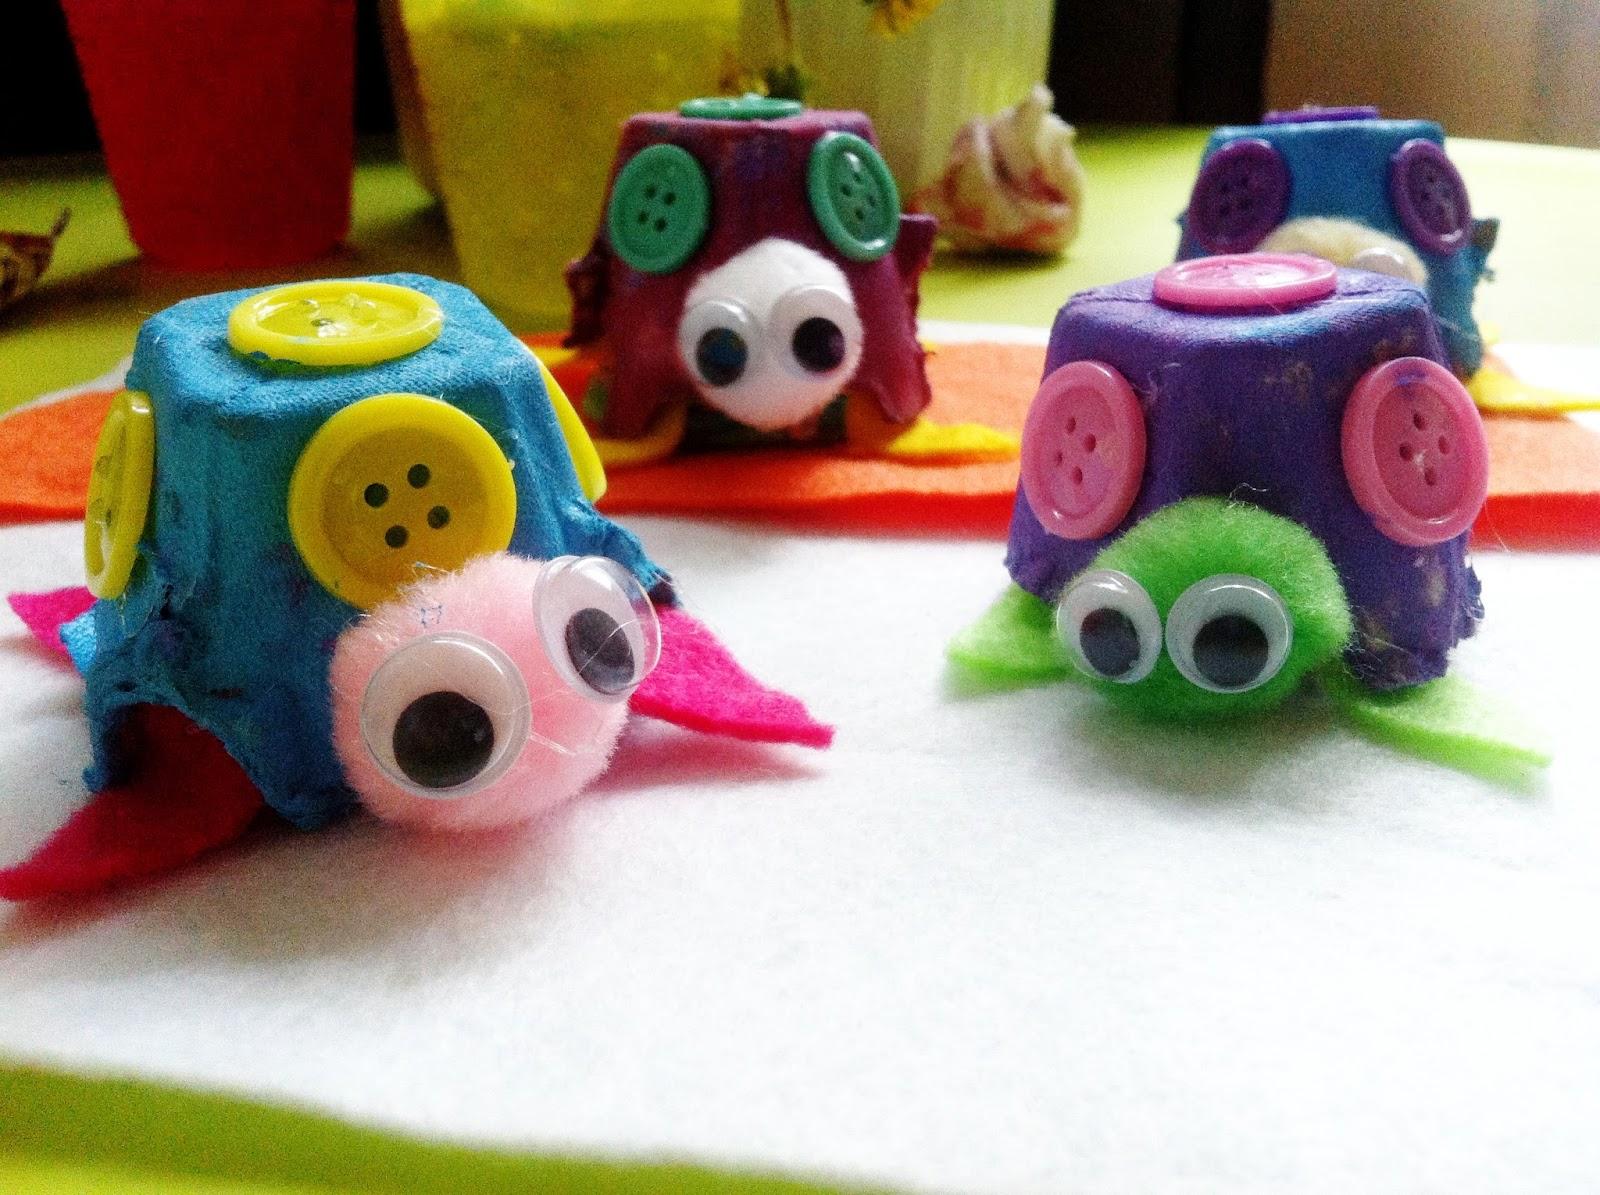 Munchkintime Easy Egg Carton Turtle Craft For Kids